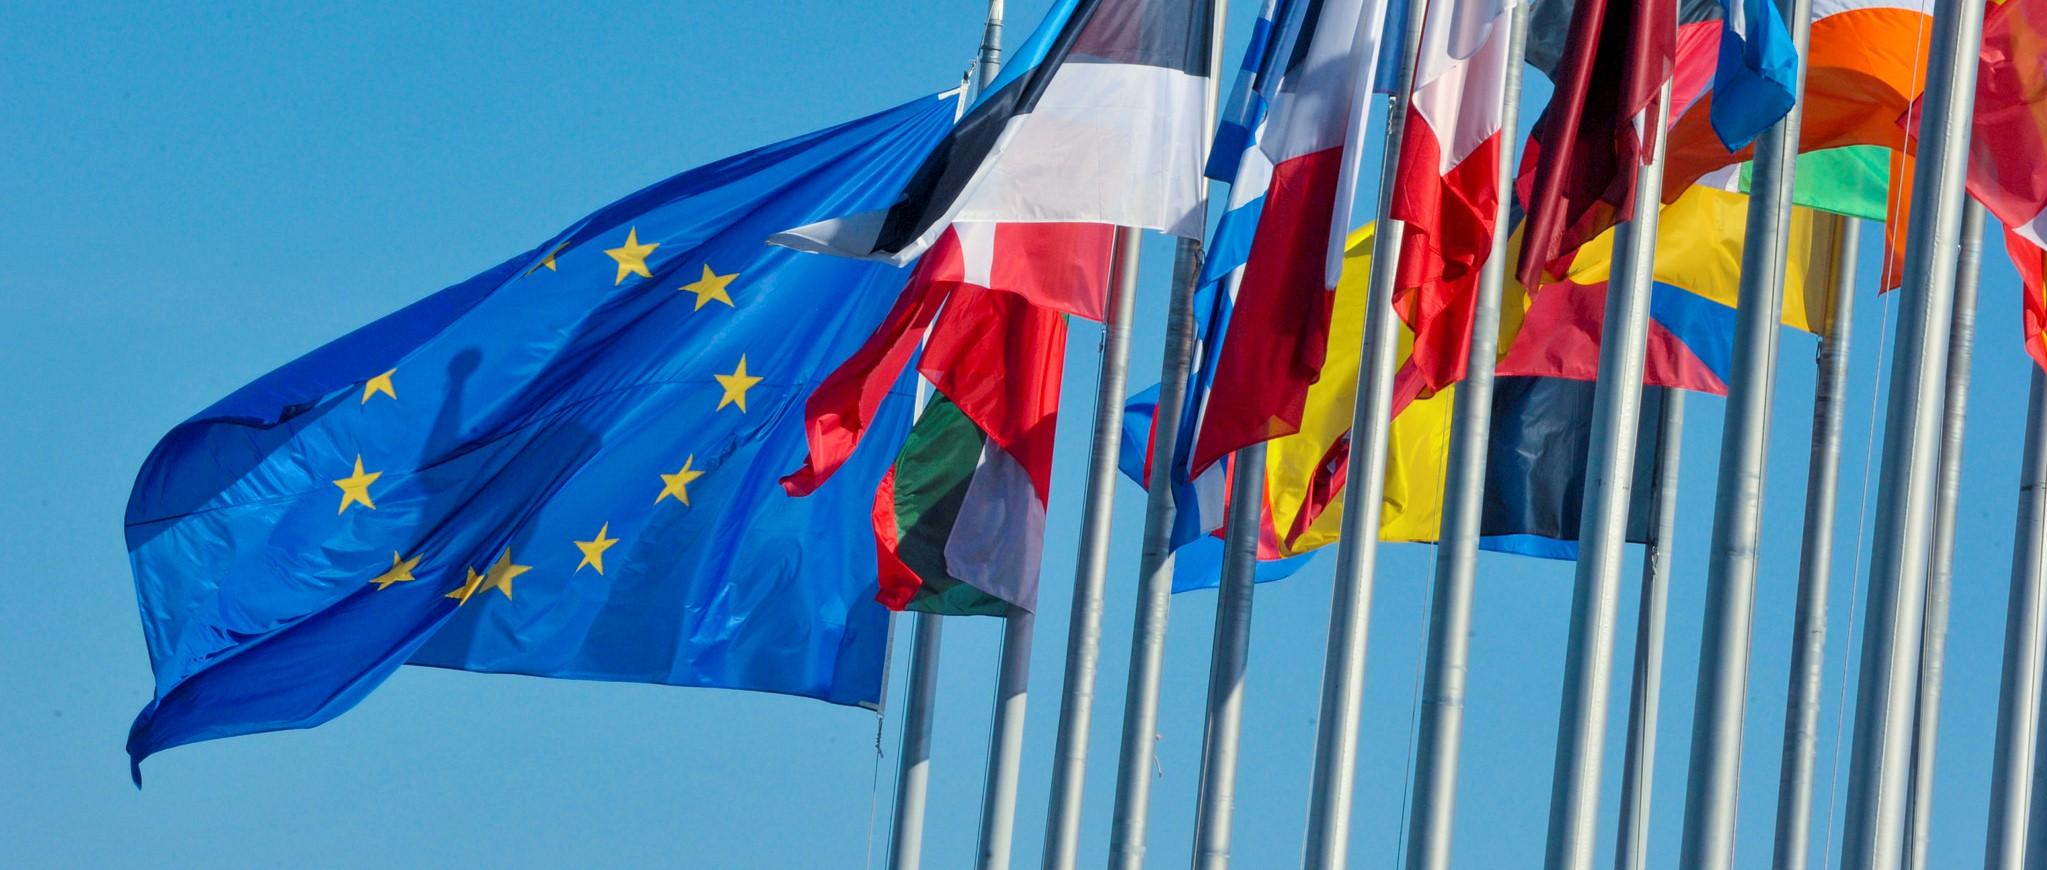 Photo: Flickr/European Parliament